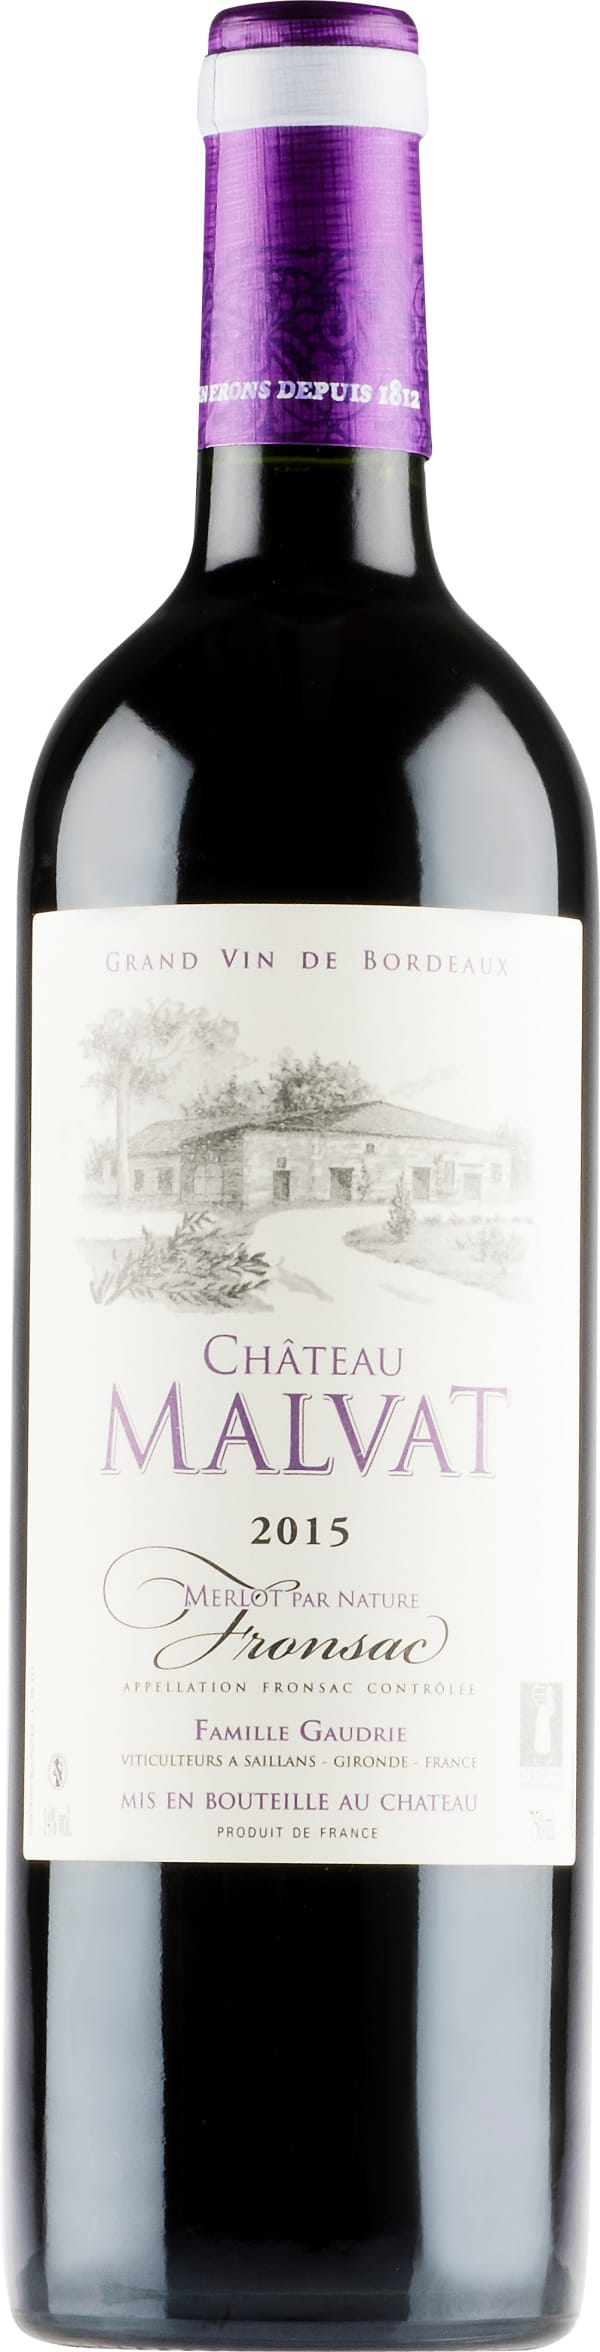 Château Malvat 2015